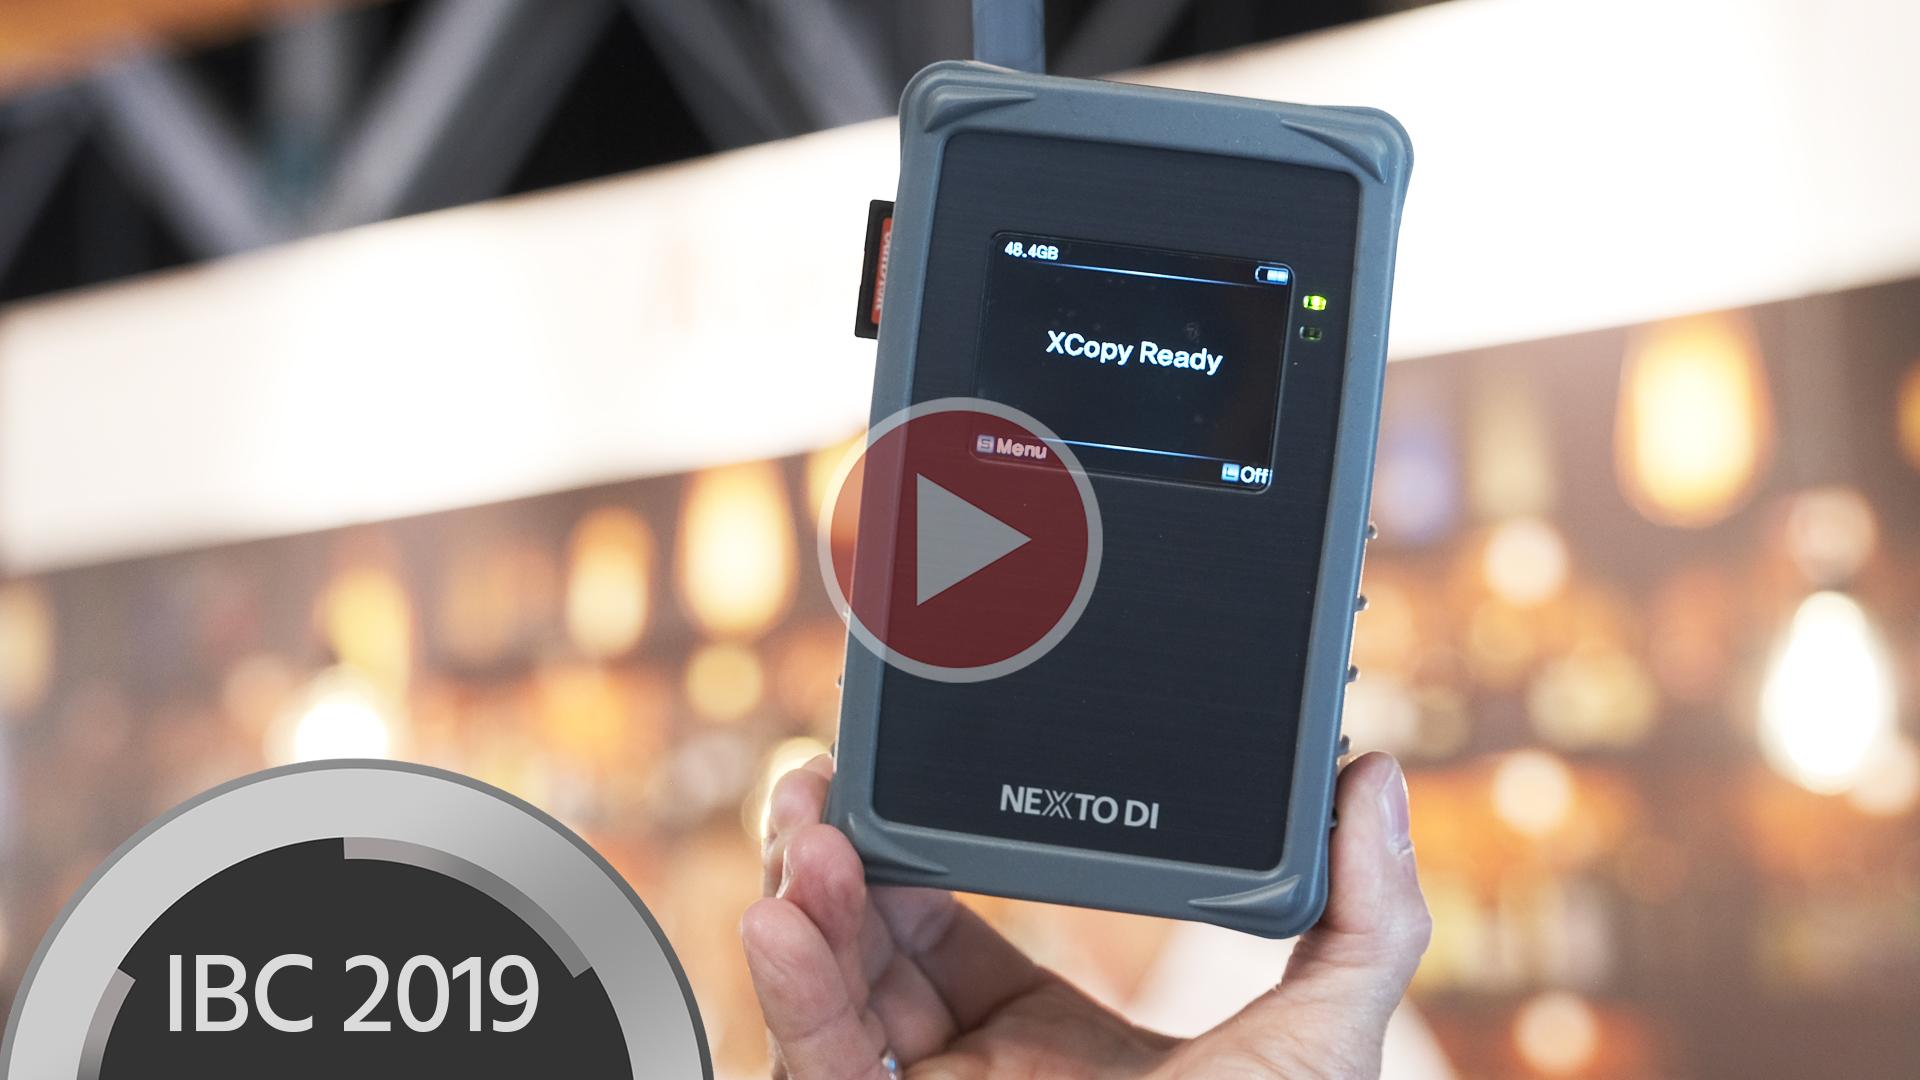 NextoDI NPS-10 - Dispositivo de respaldo portátil